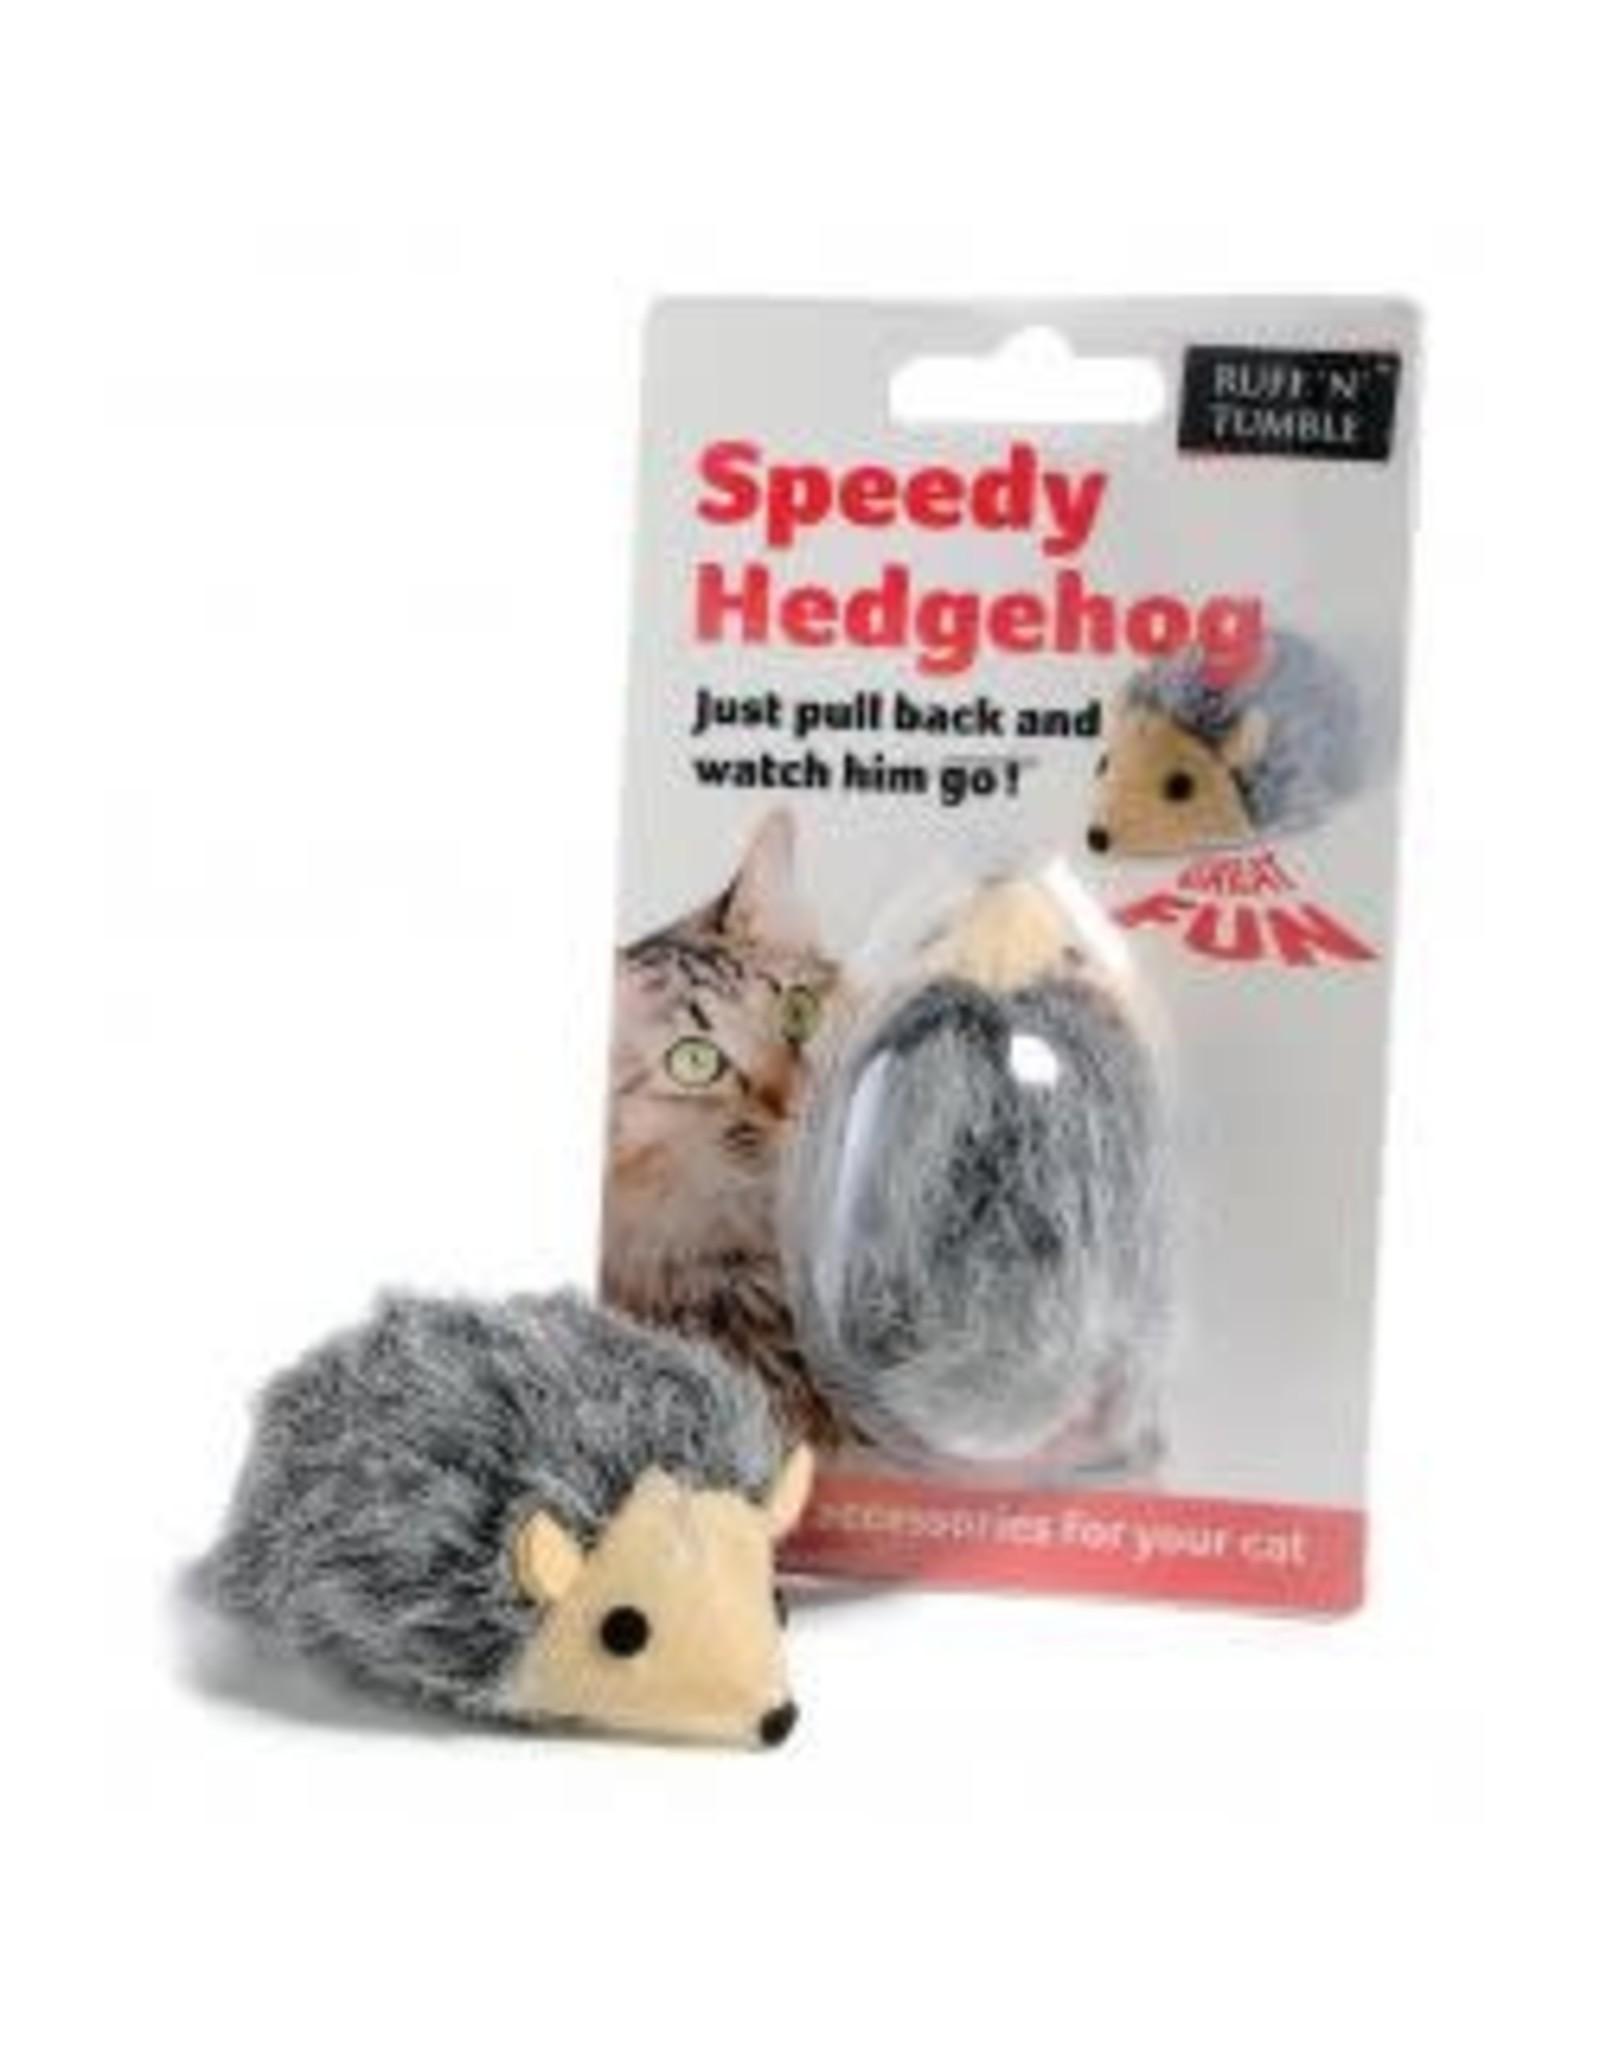 Sharples Speedy Hedgehog Cat Toy